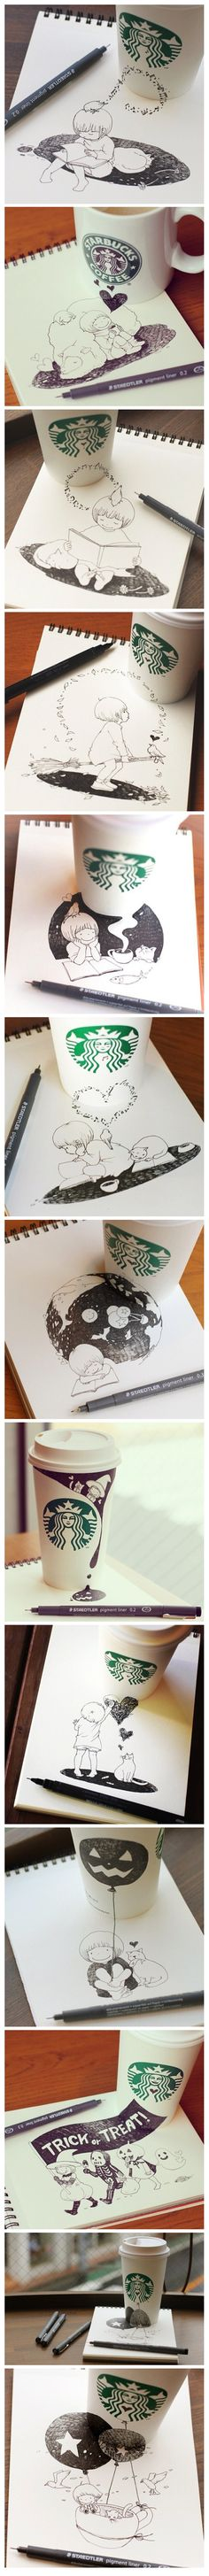 Lovely doodles w Starbucks cups by Japanese artist Tomoko Shintani.